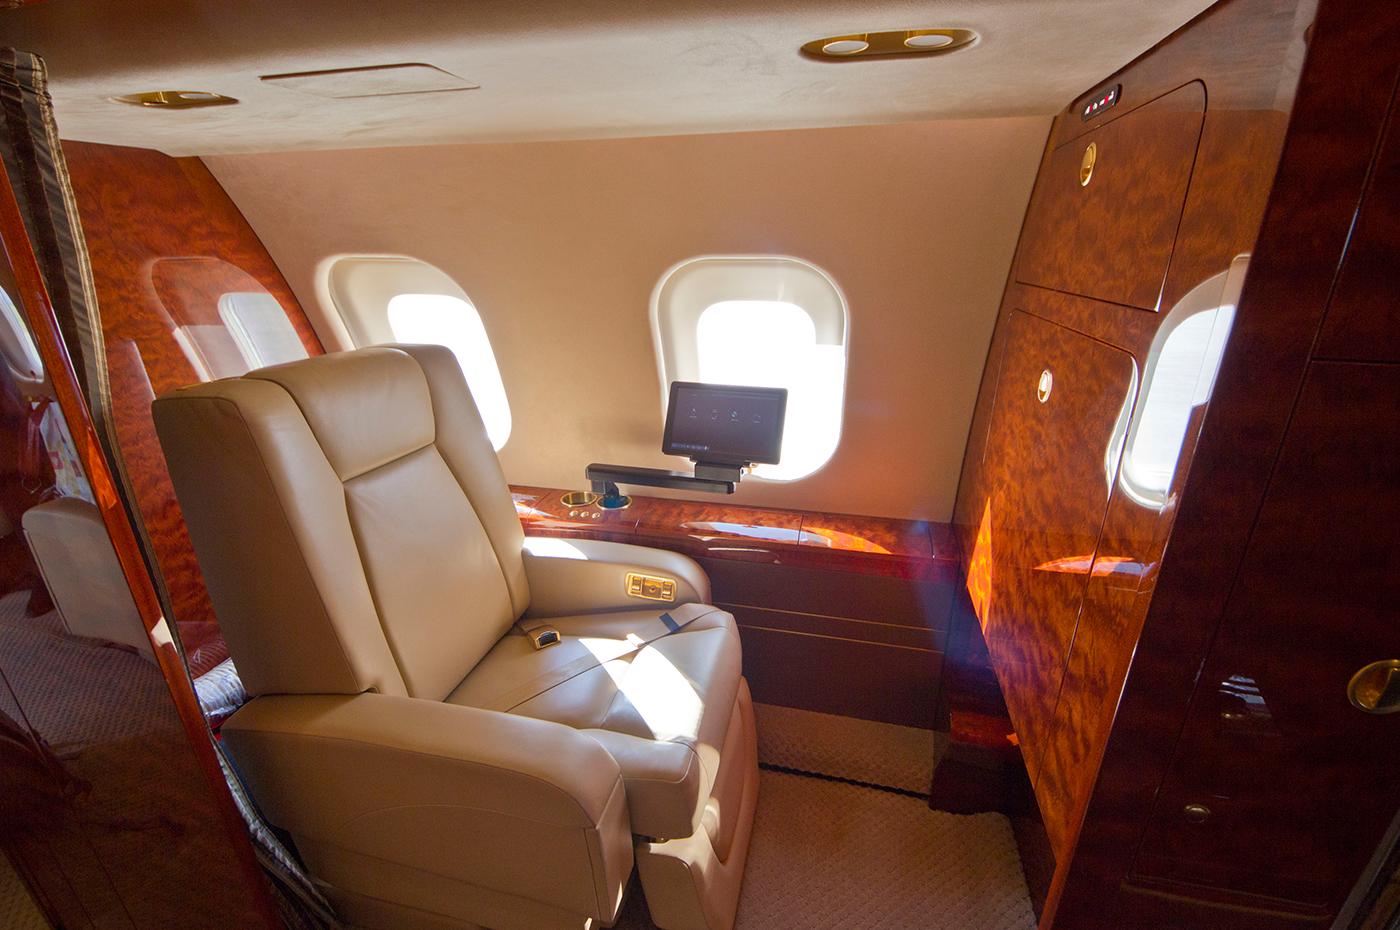 Global Express Vision 6000 S/N9490 - Crew seat